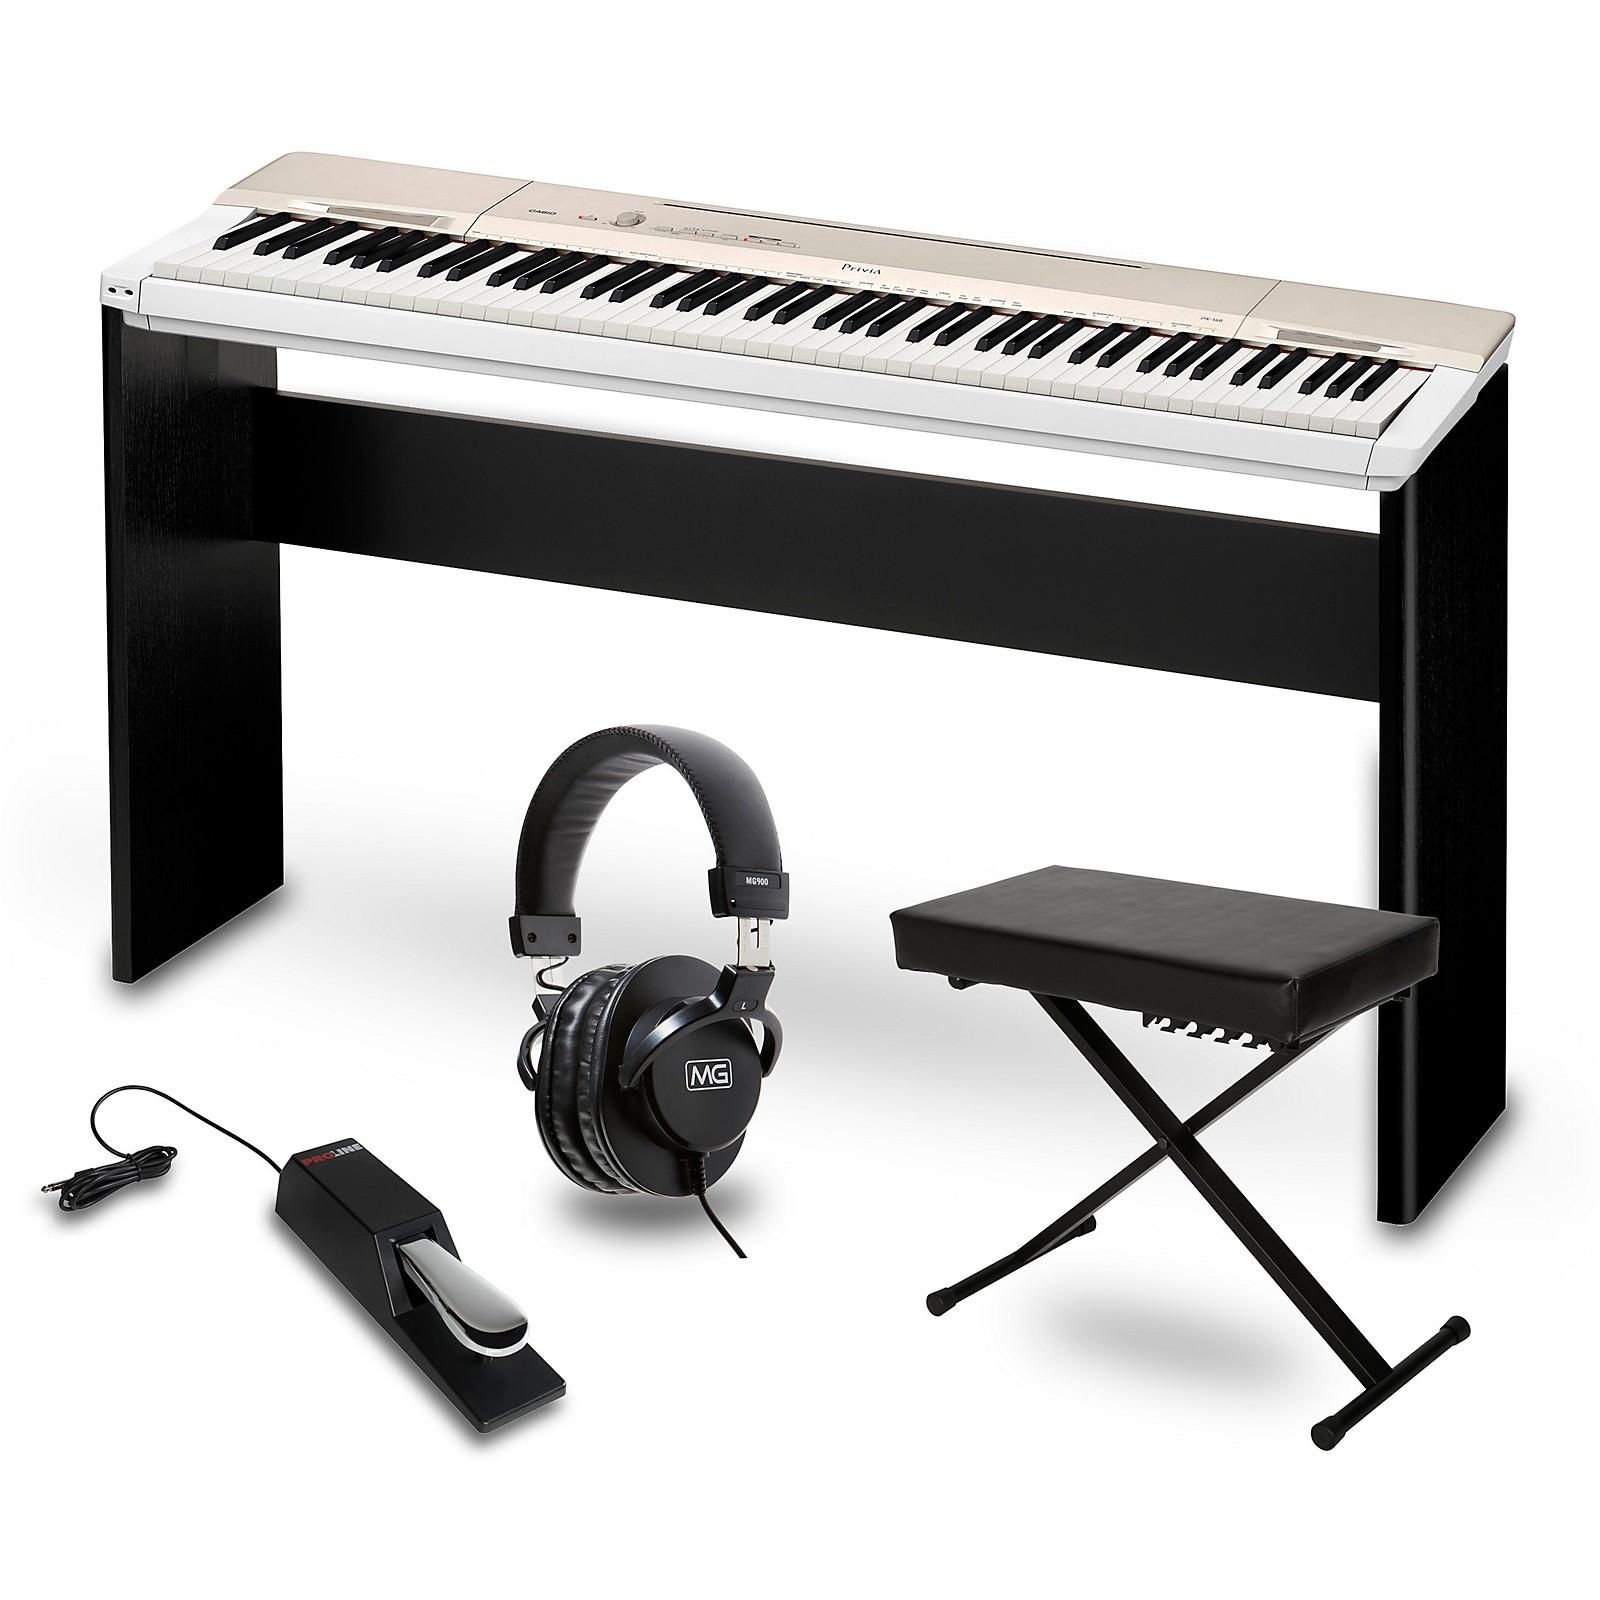 Casio Privia PX-160GD Digital Piano Package